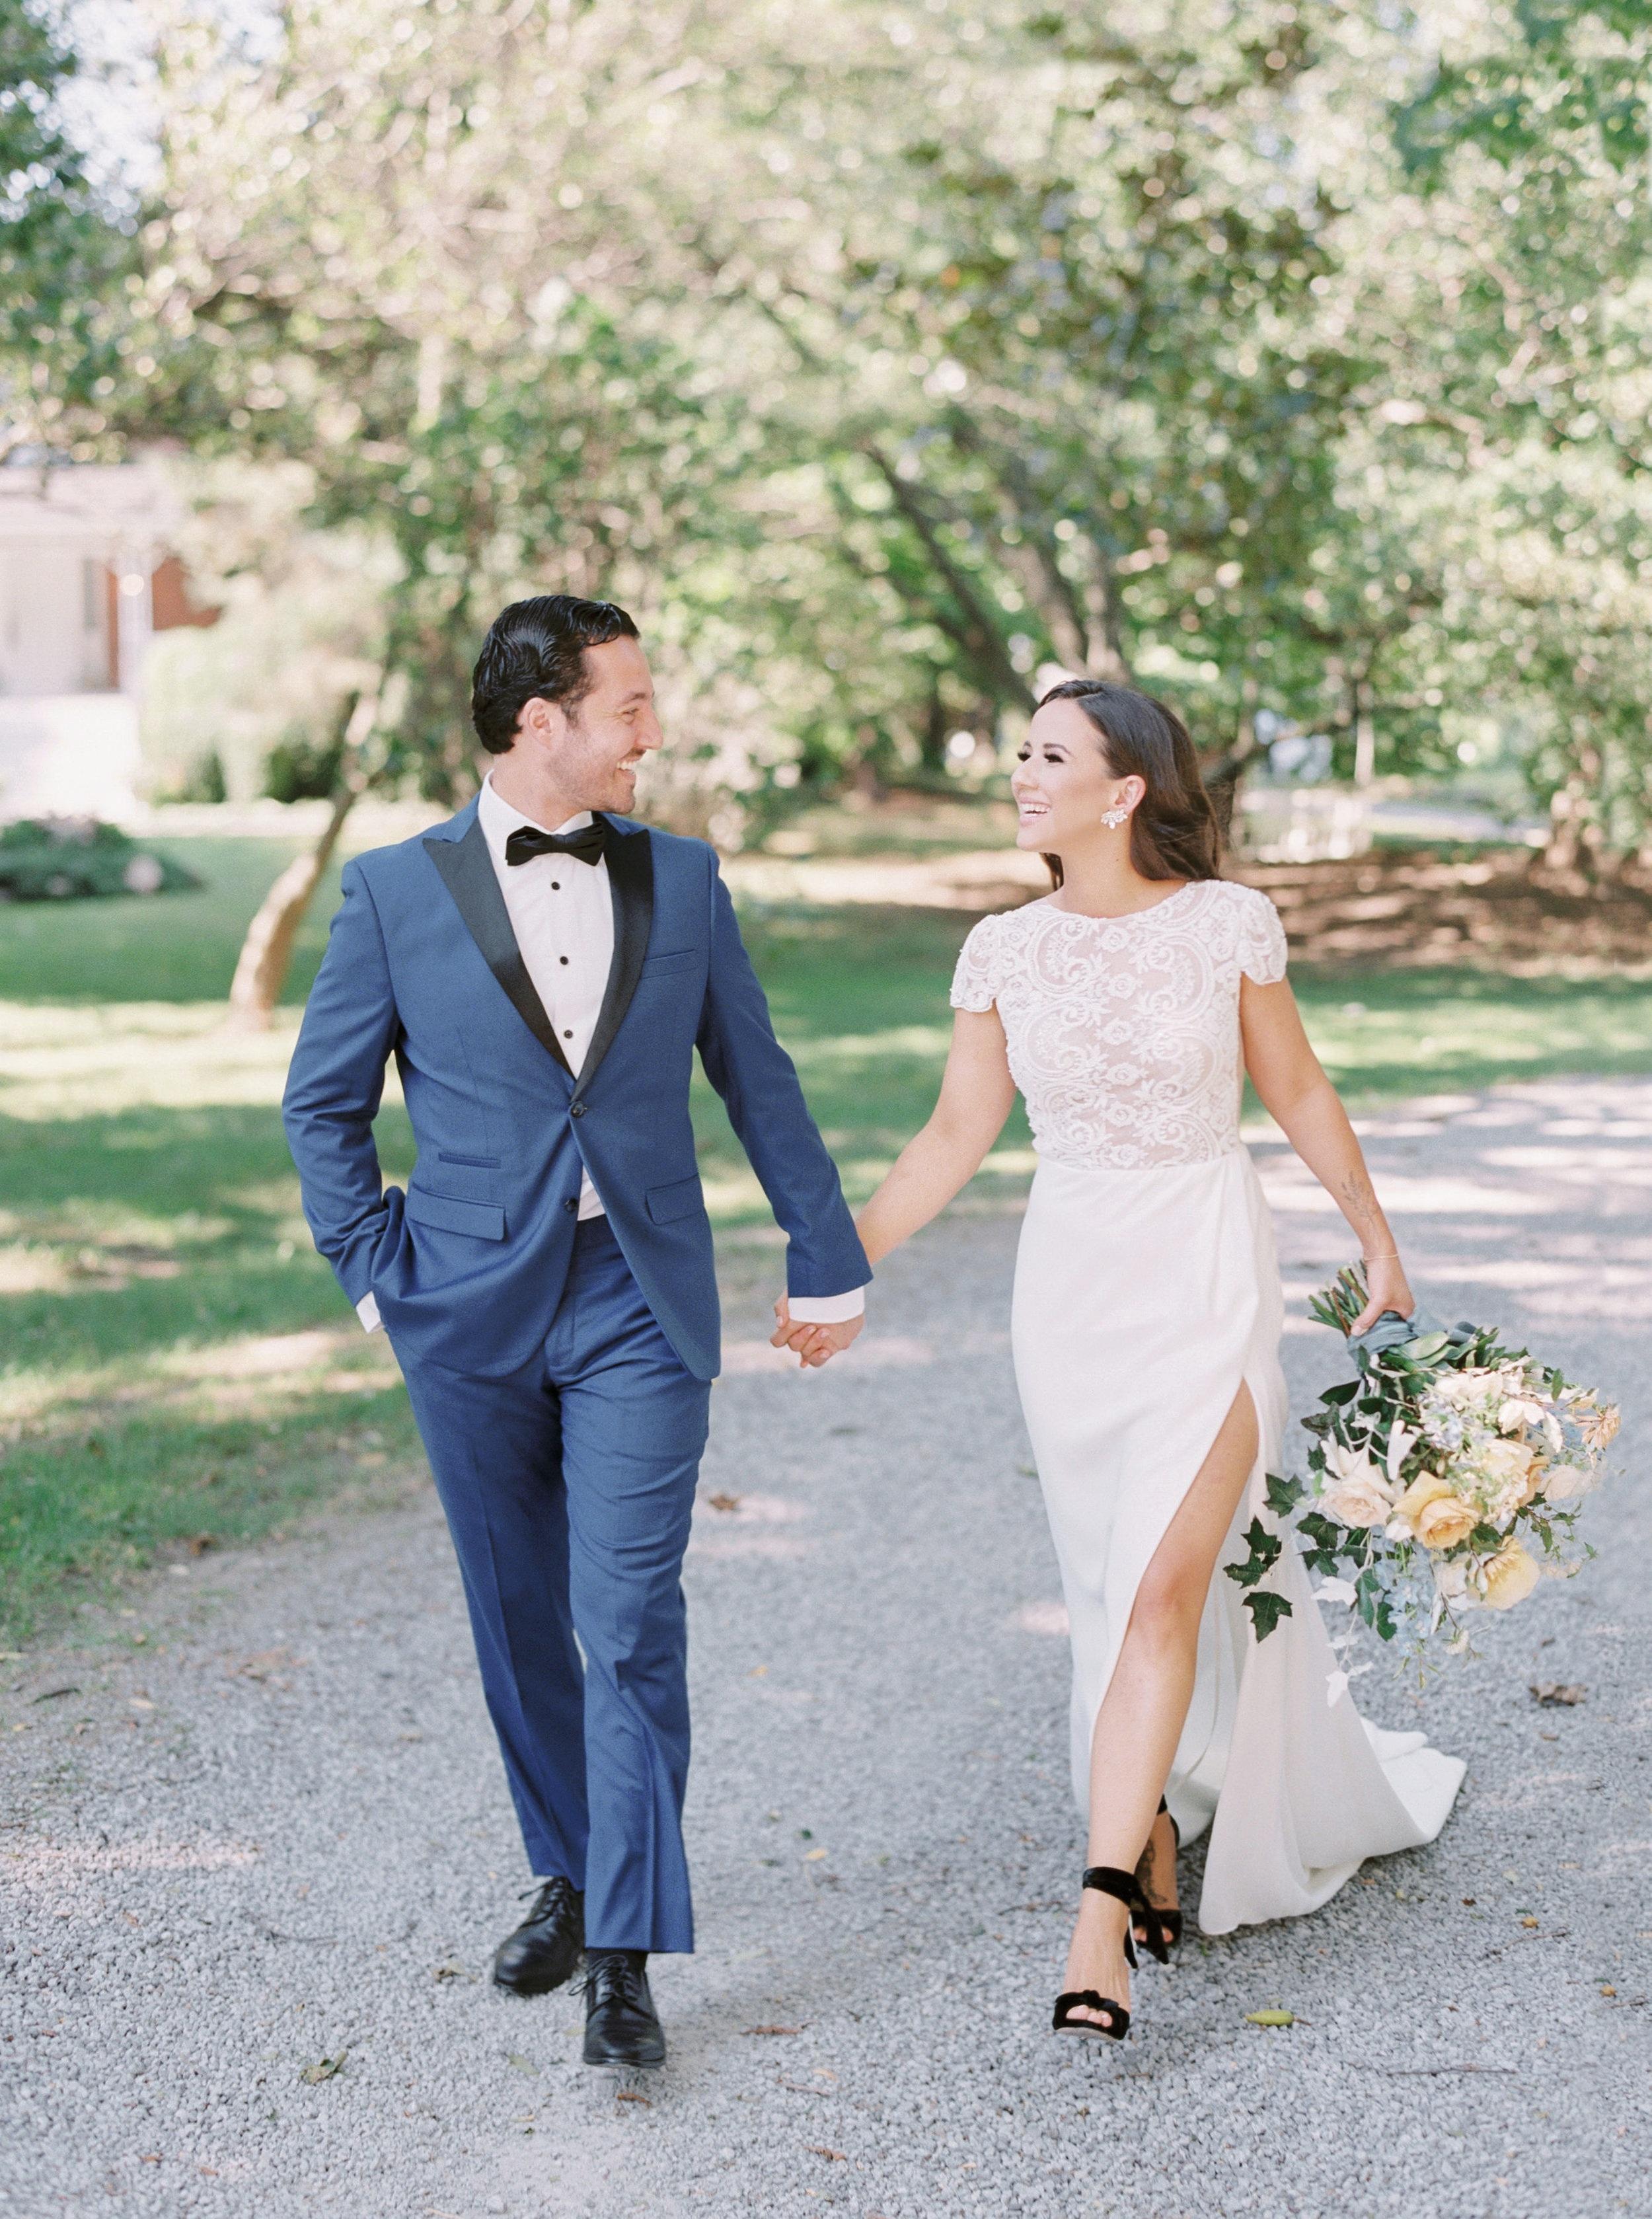 gracewood-wedding-photographer-soft-airy-kurtz-toronto-danielle-carmen-gallery-1171.jpg